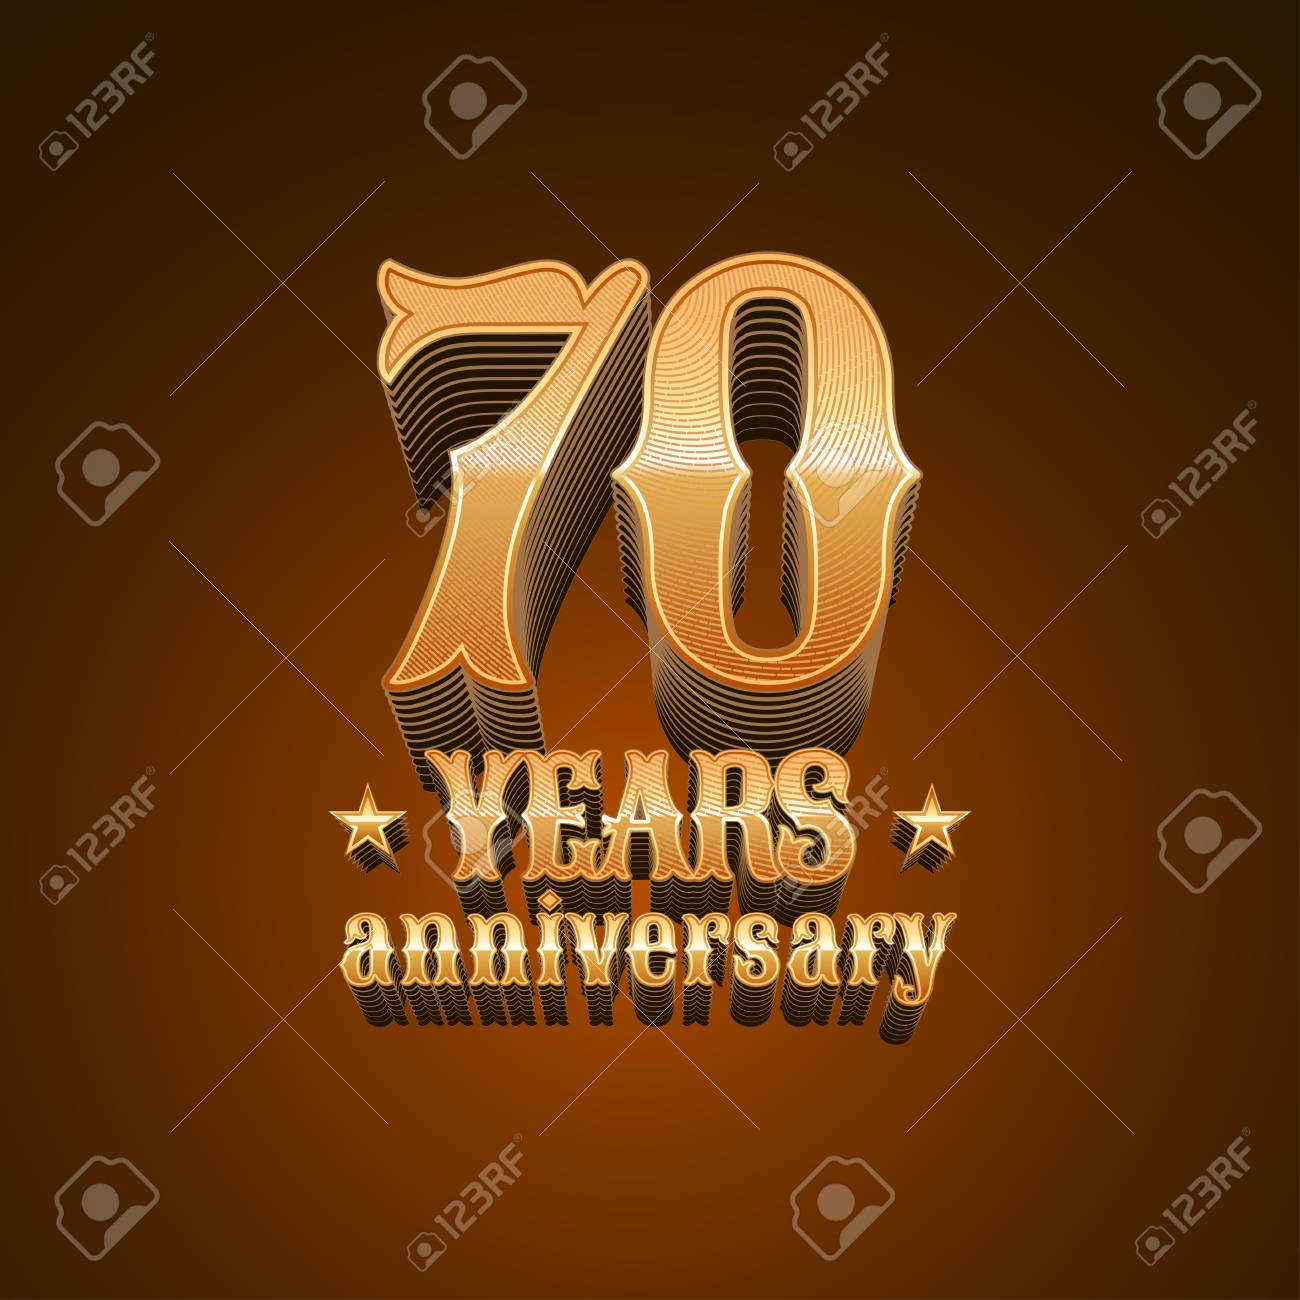 70 Years Anniversary Vector Icon 70th Birthday Decoration Design